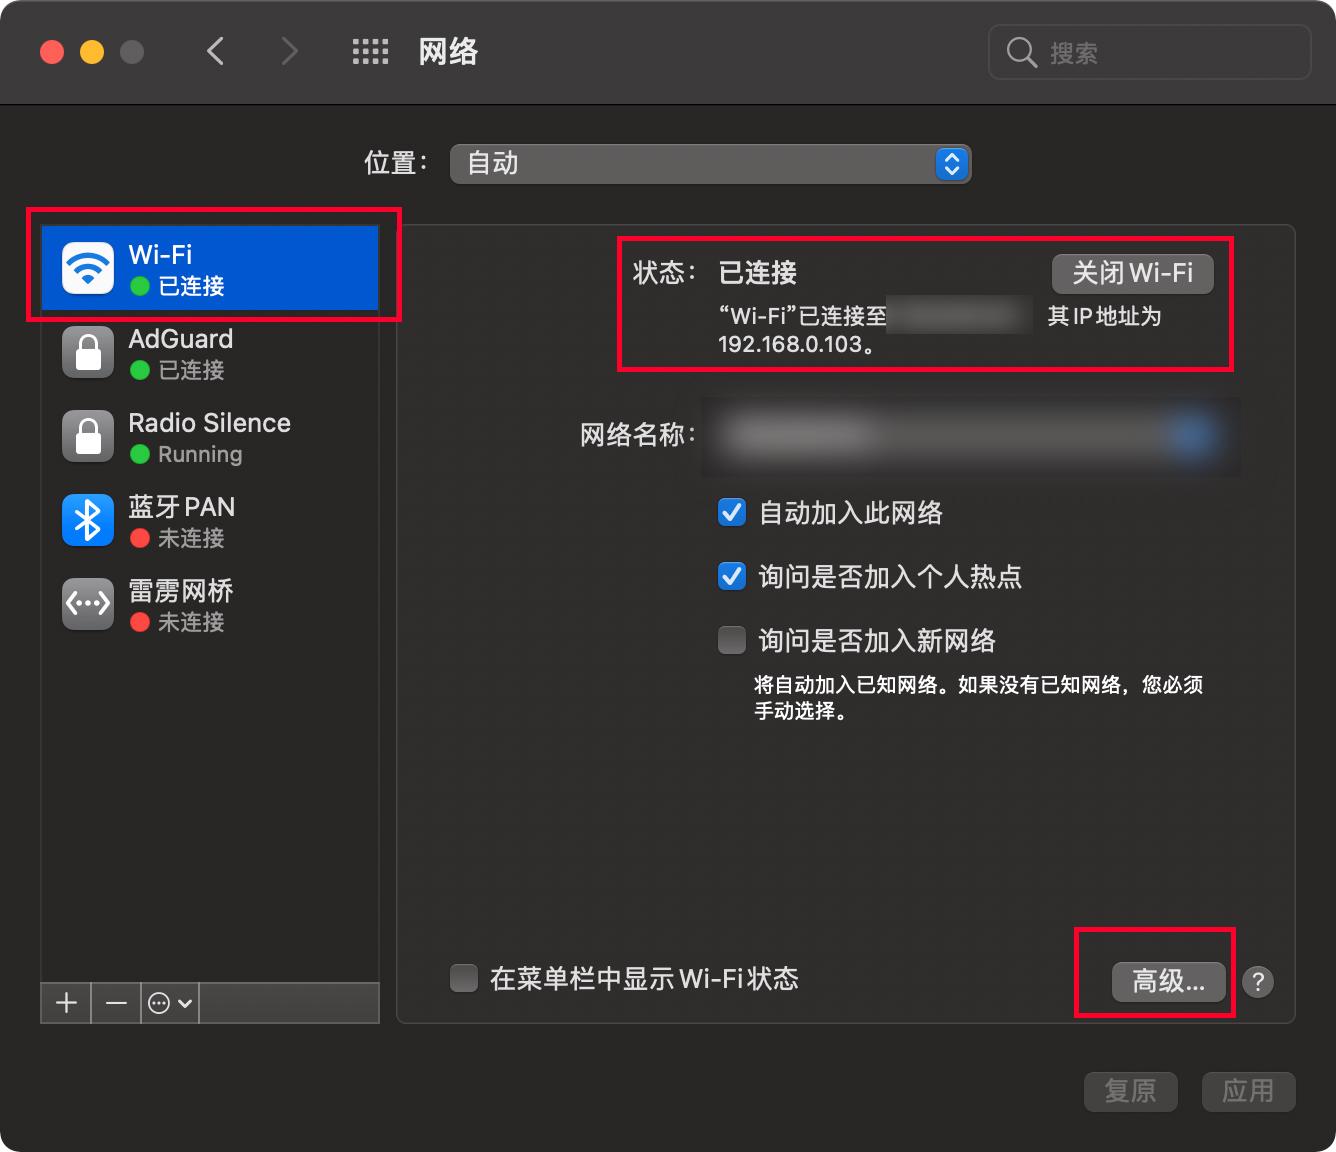 Mac 网络 - 网络偏好设置 - 高级设置.png